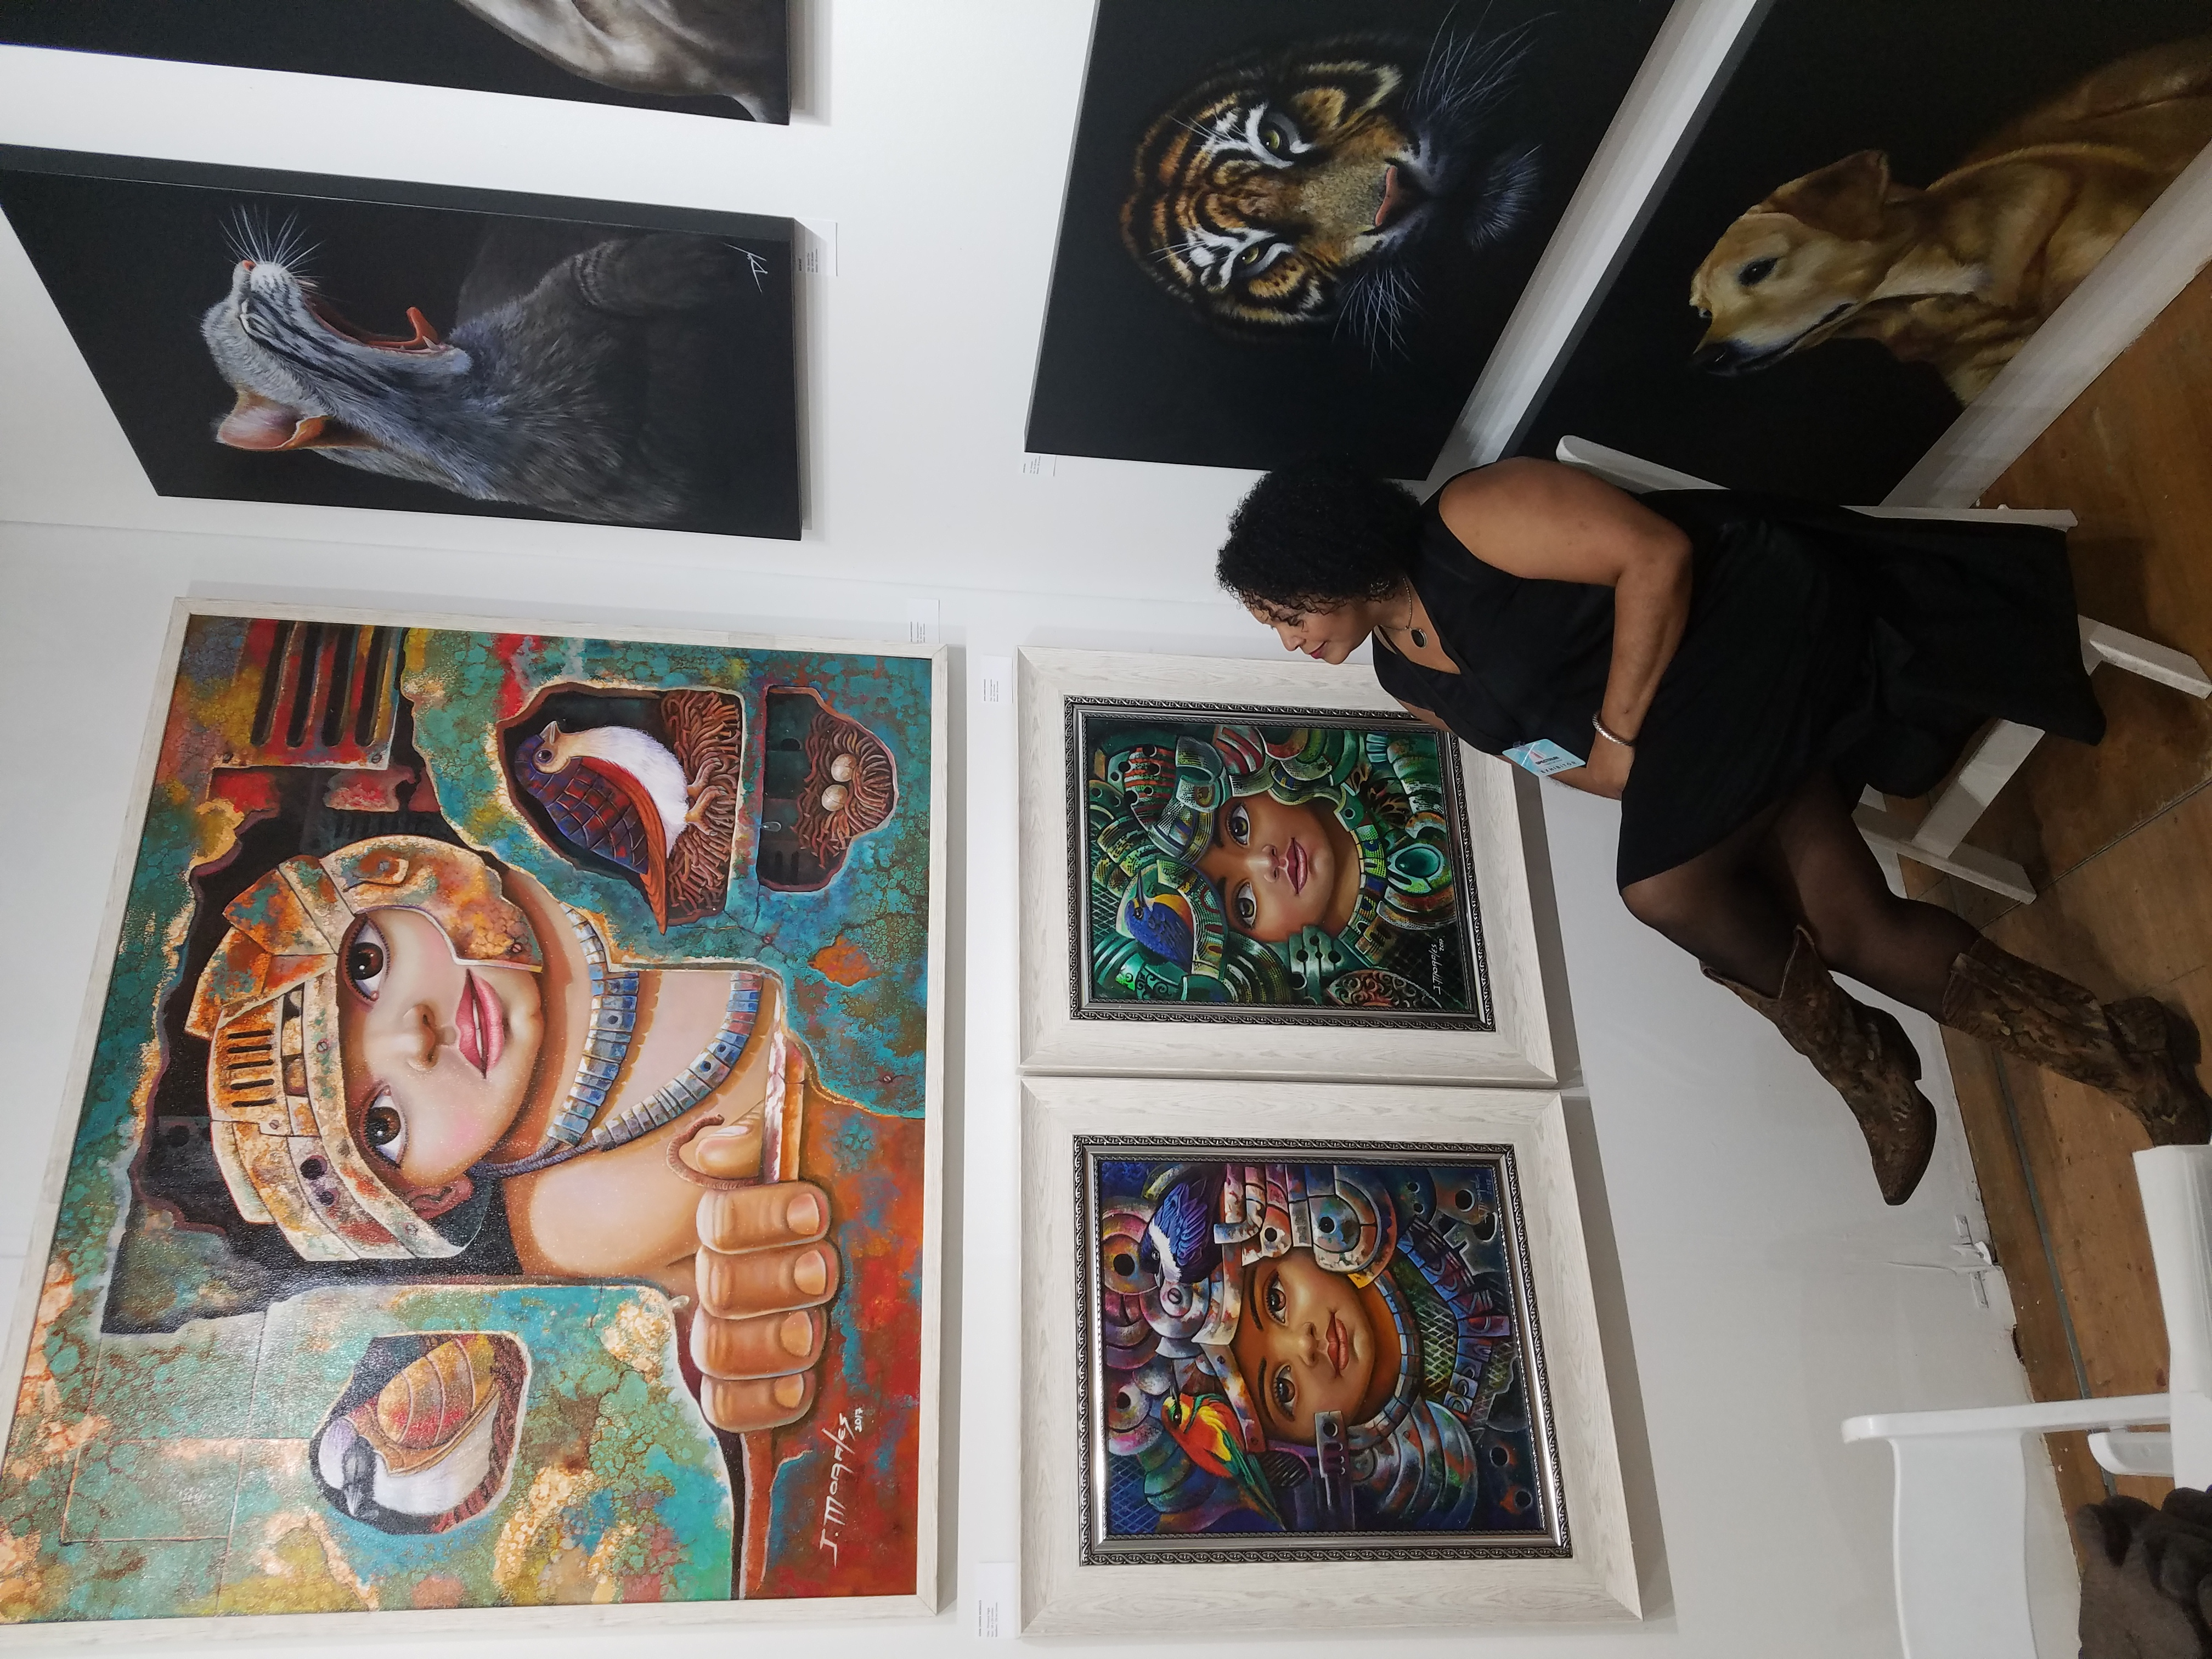 Admiring John Jaimer Morales' work